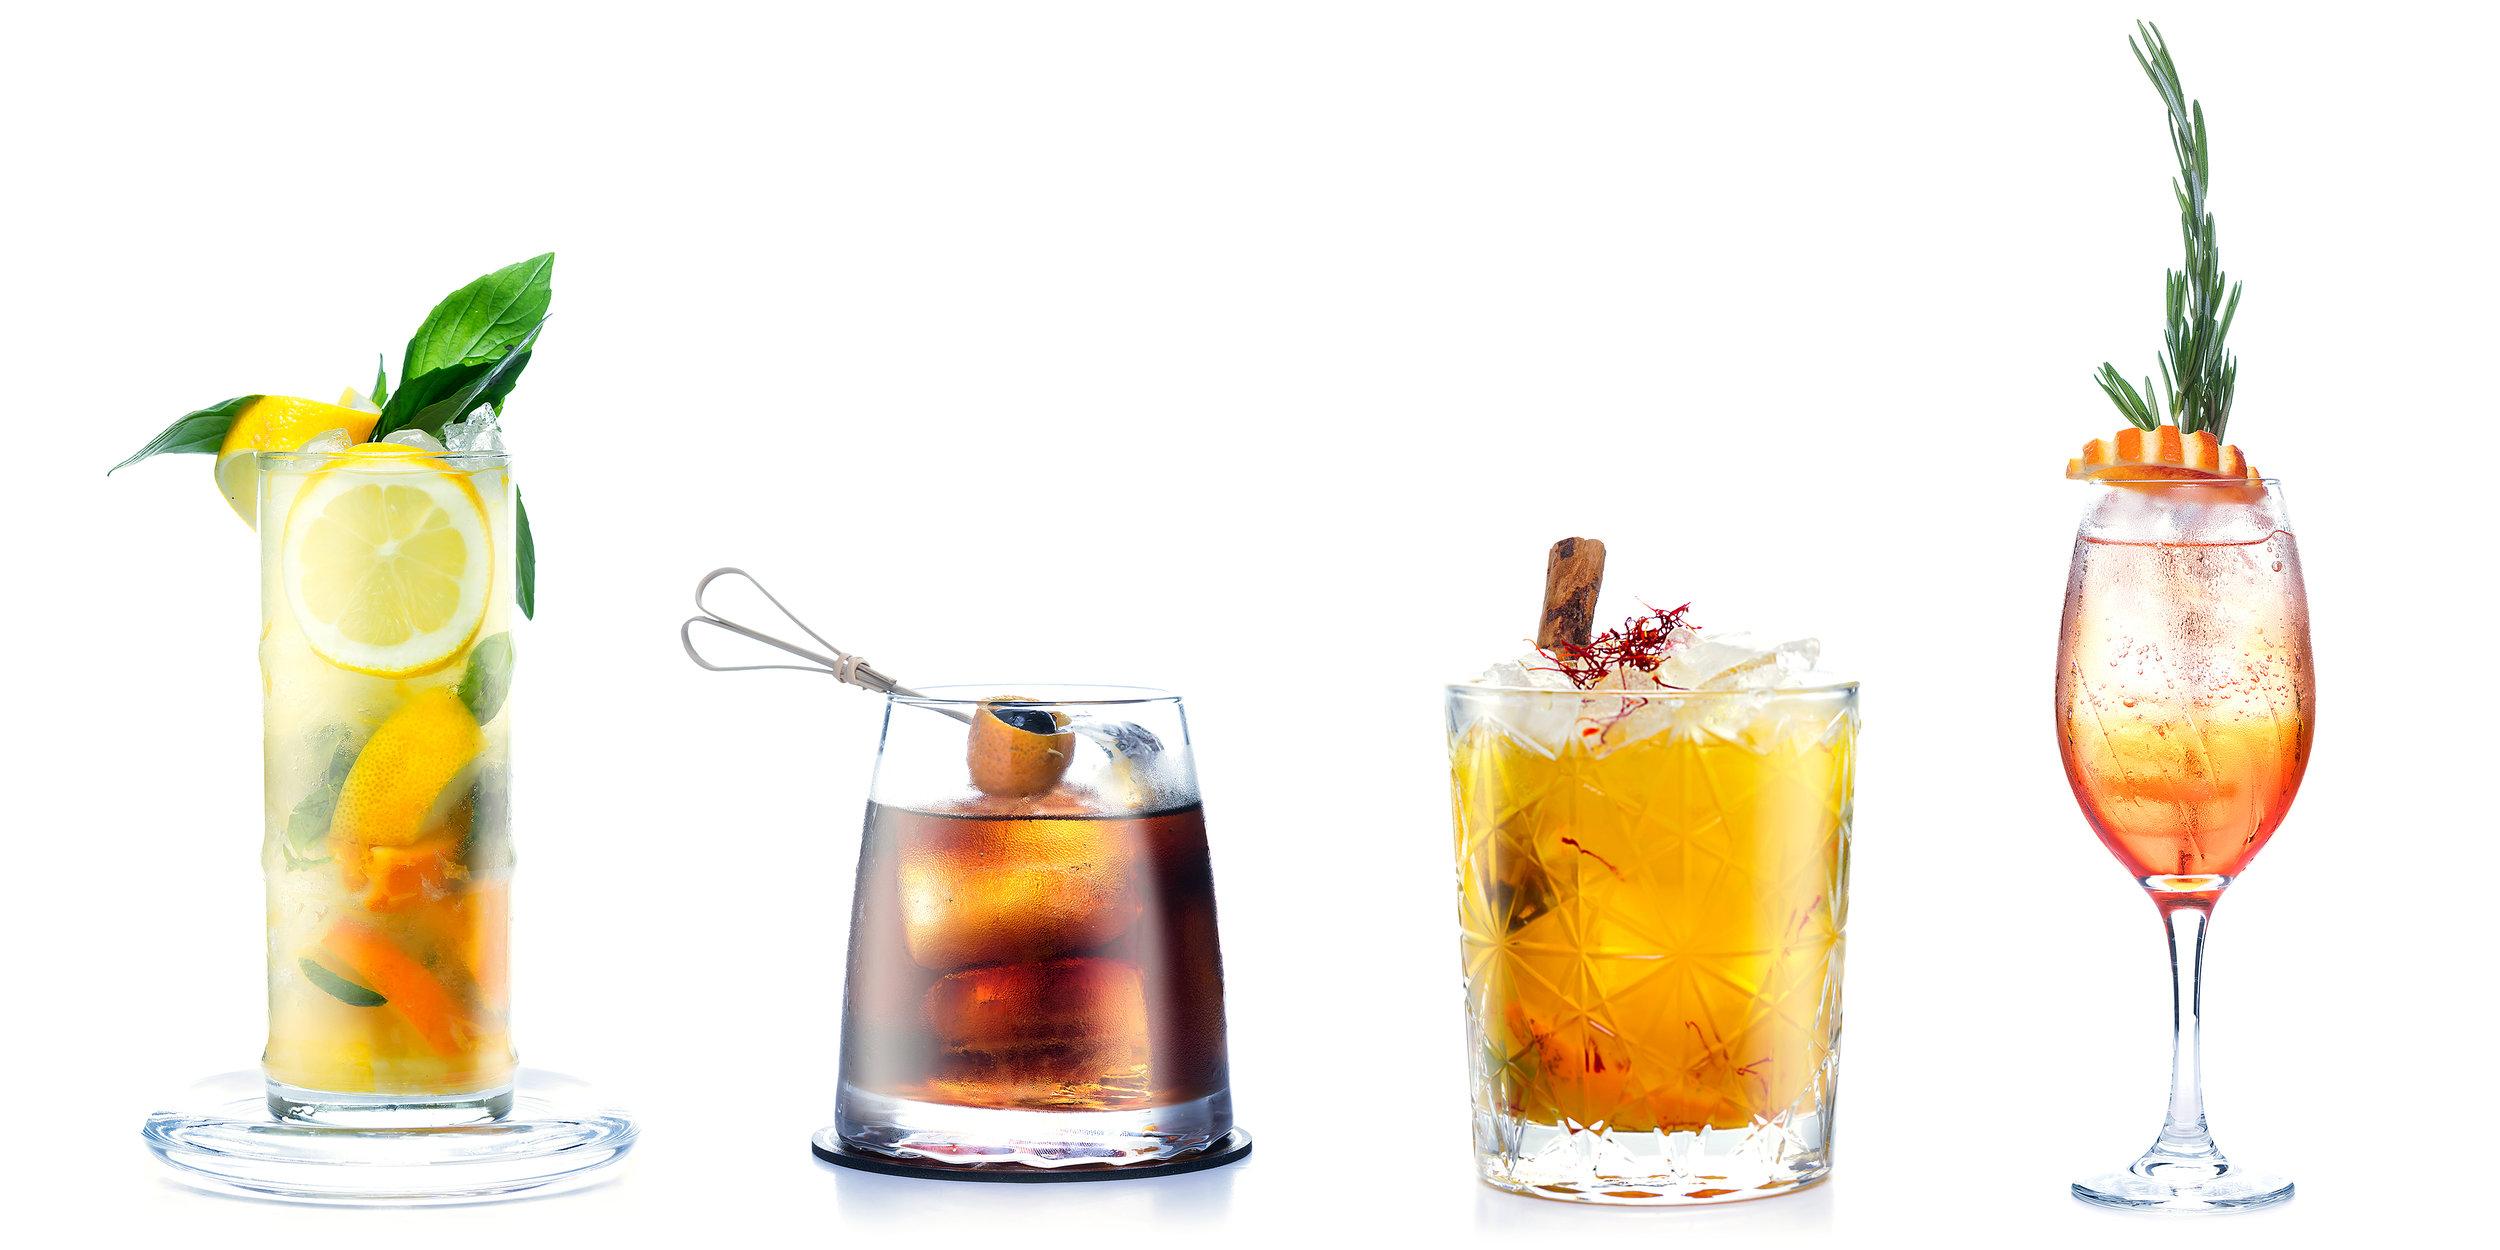 bebidas-drinks-cocktails-cocteles-photographer-fotografo-photography-fotografia-mixology-bartending-La-Sole-del-Pimpi-Malaga-Sr-Erreka-Photo-diego-erreka-shakti-de-raco-españa-spain-producto-publicidad.jpg